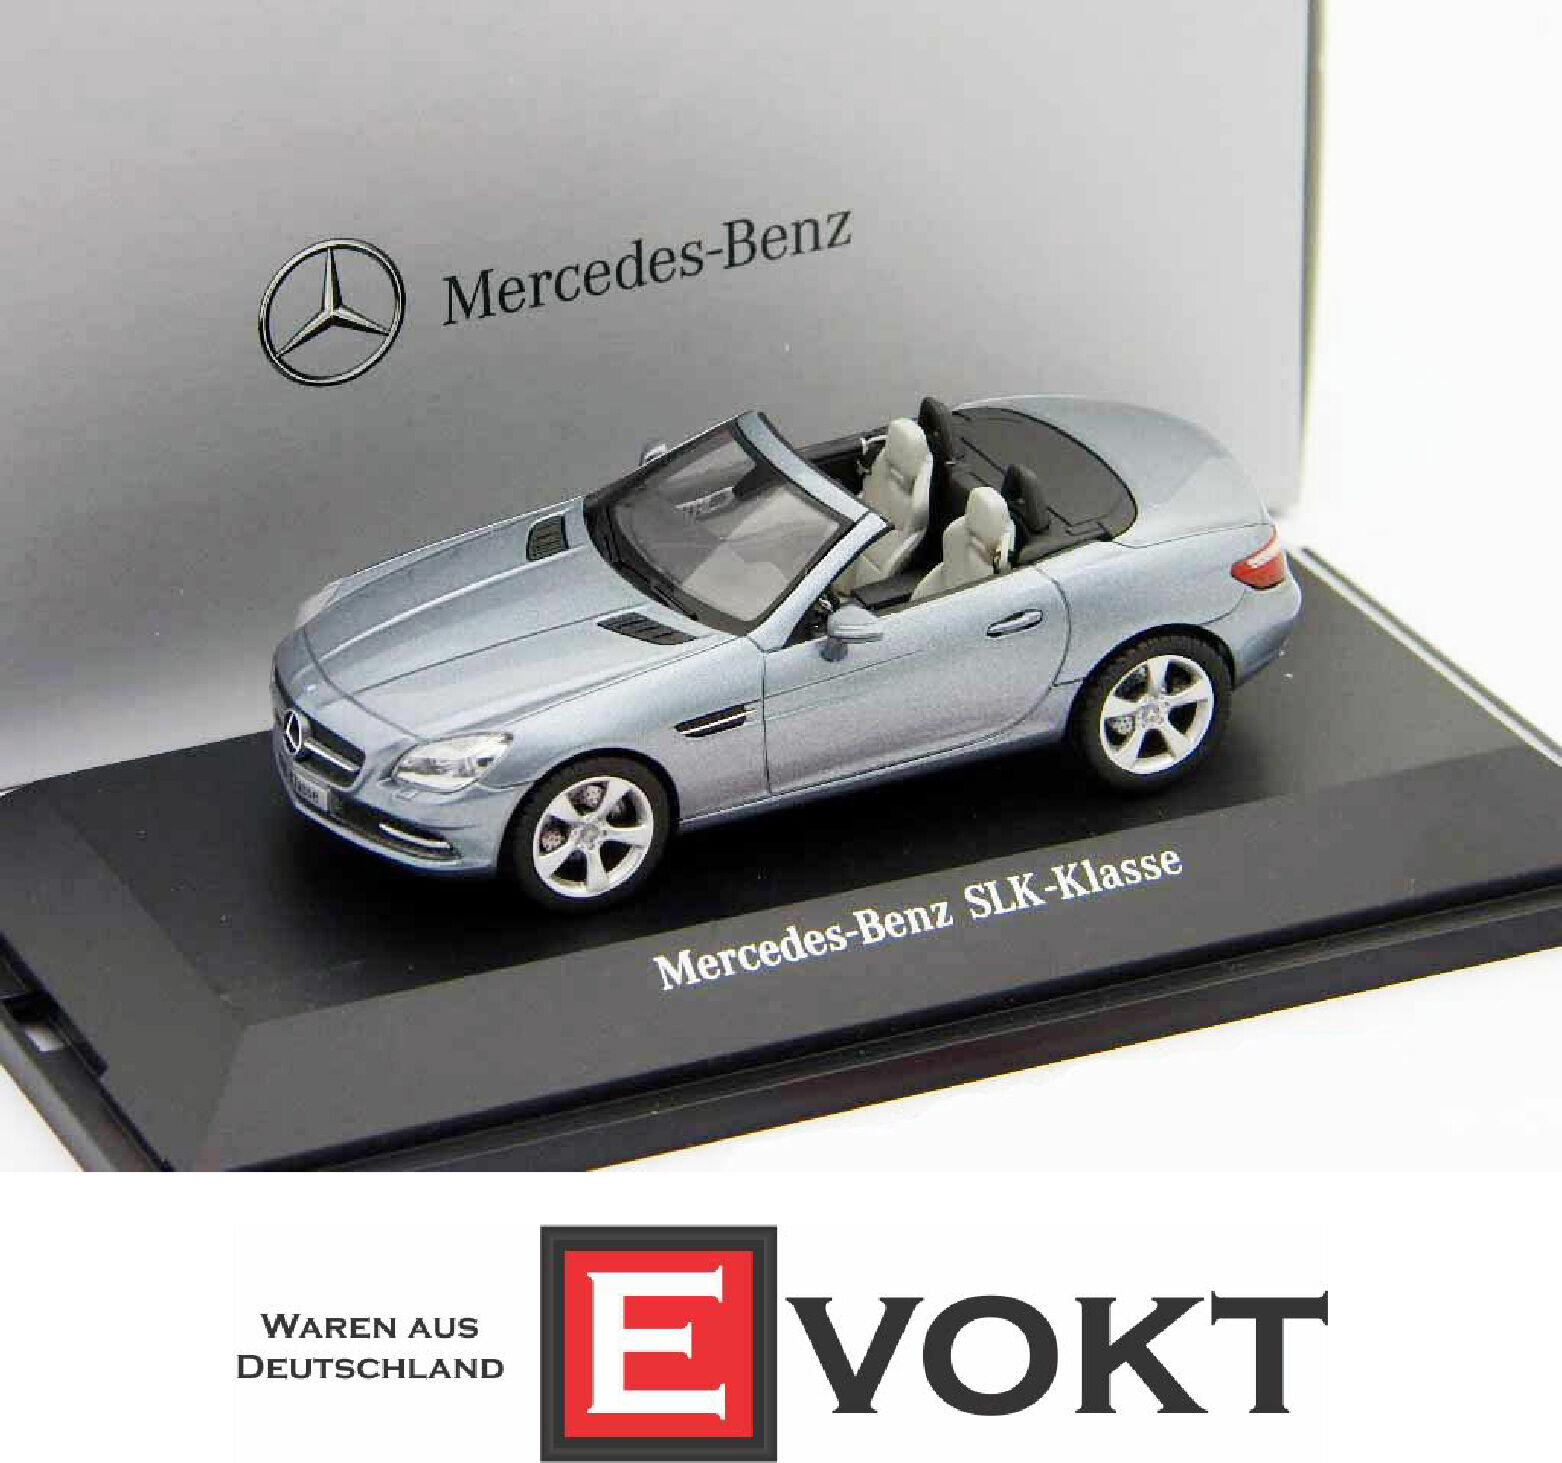 Mercedes-Benz SLK  Convertible Roadster Galenitargent Metallic 1 43  économiser jusqu'à 70%